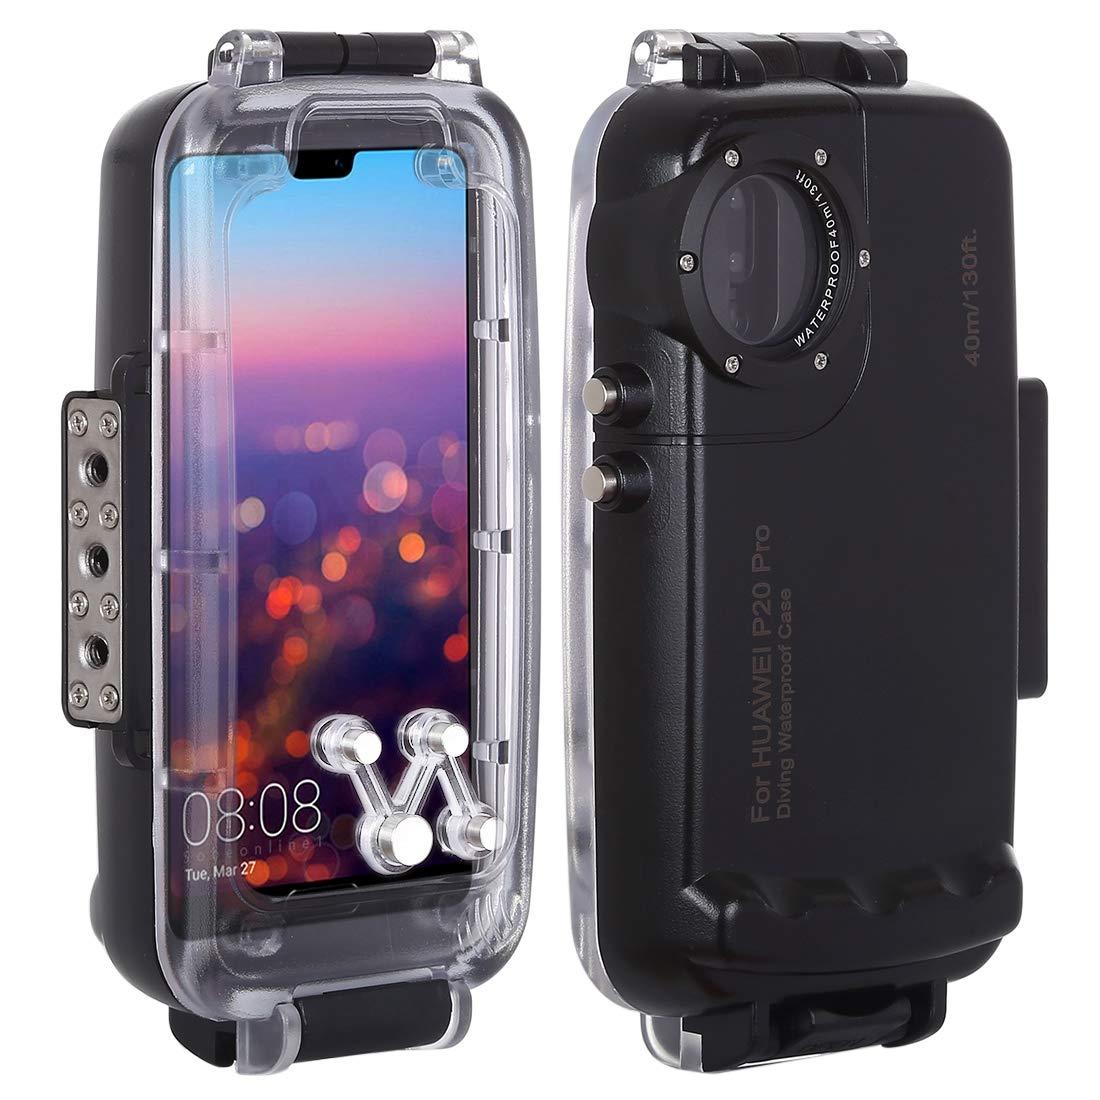 HAWEEL Huawei P20用水中カバーケース 40m / 130ft防水ダイビングハウジングPC, ABS製 IPX8防水認定 360度全方位保護 写真ビデオ撮影用 B07MV66K97 黒 Huawei P20 Pro用 Huawei P20 Pro用|黒